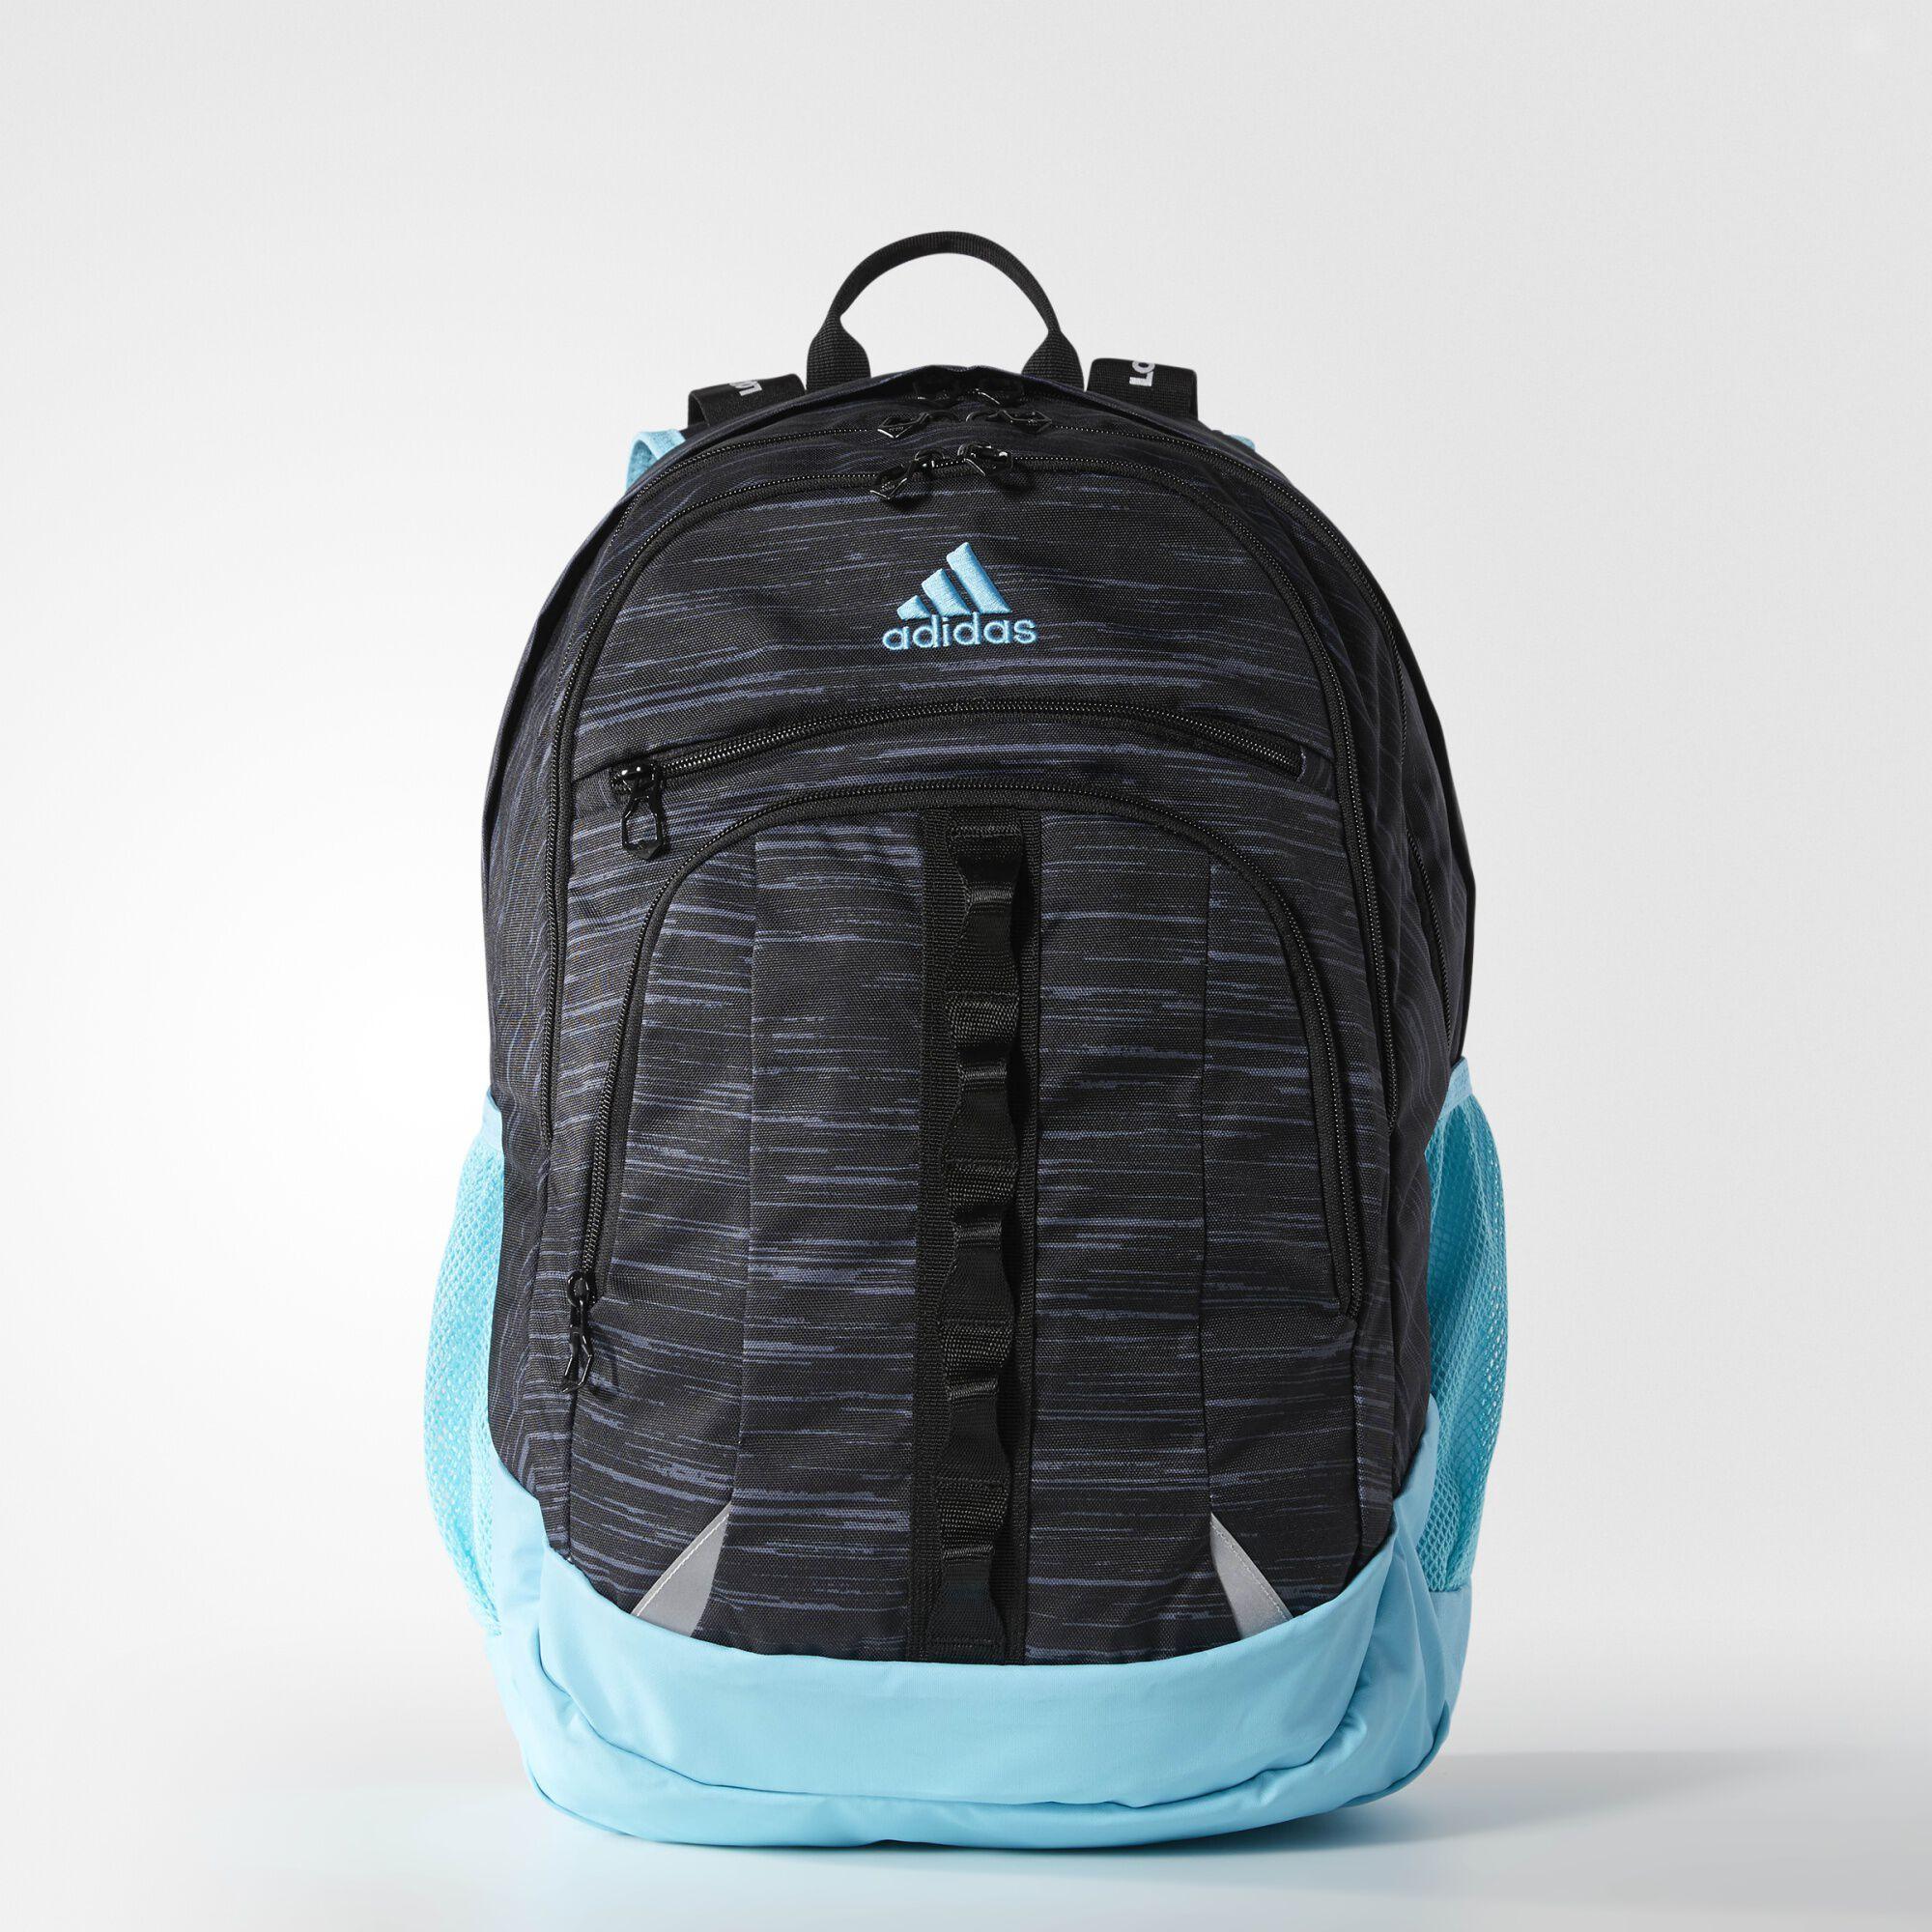 22cf32e49ccd Buy adidas neon green backpack